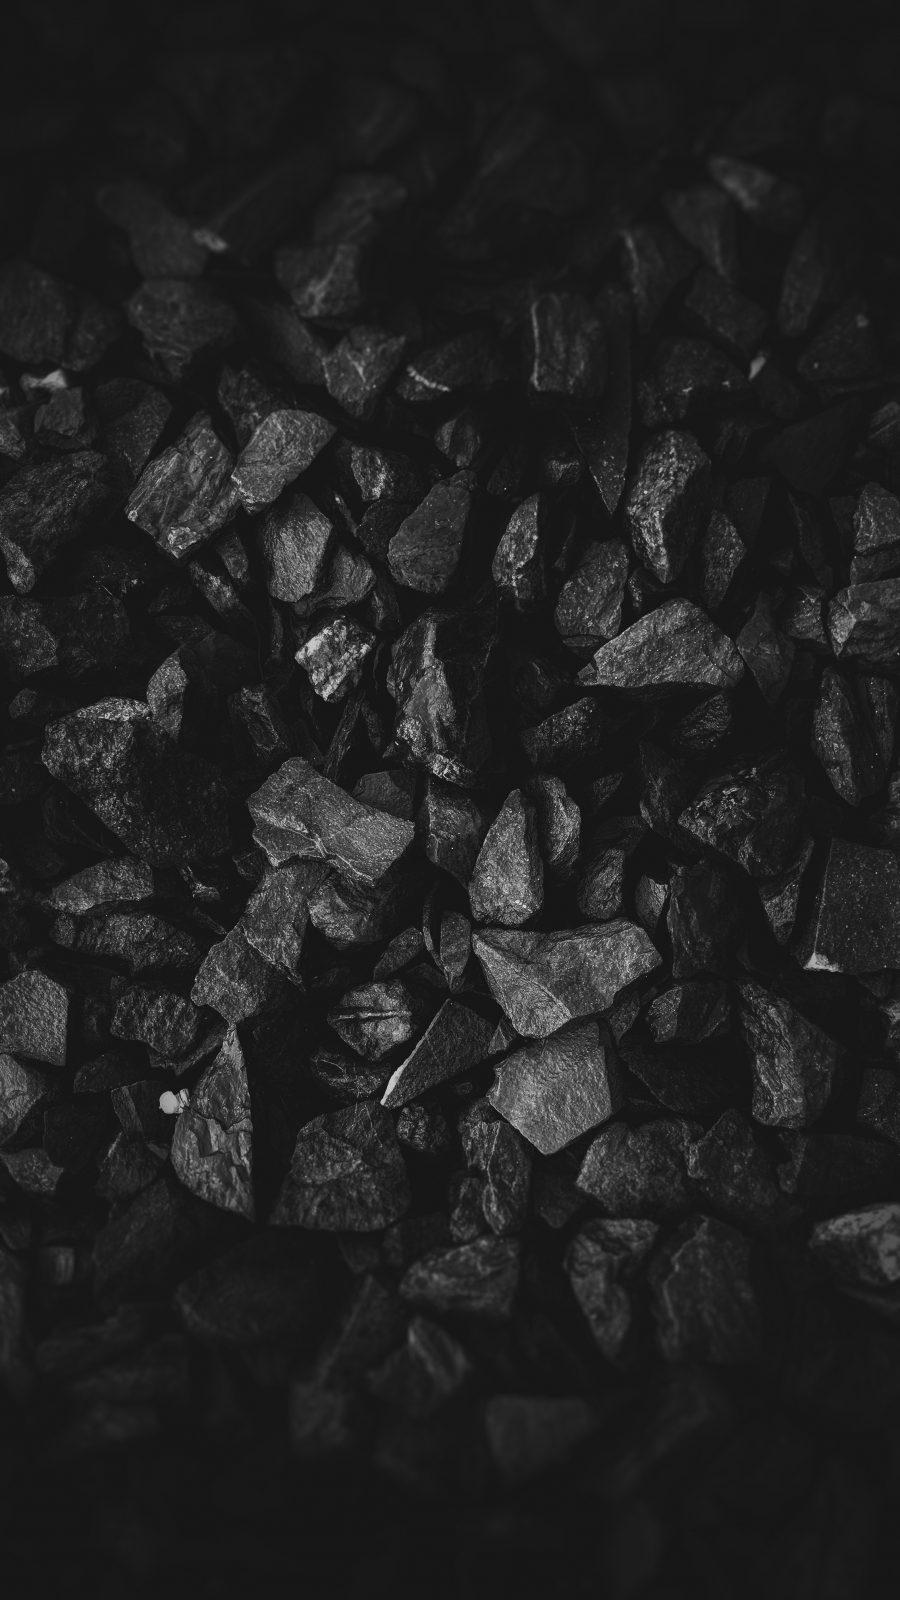 EPA I Clean Energy Rule (ACE) Rolls Back Regulations for Coal Industry